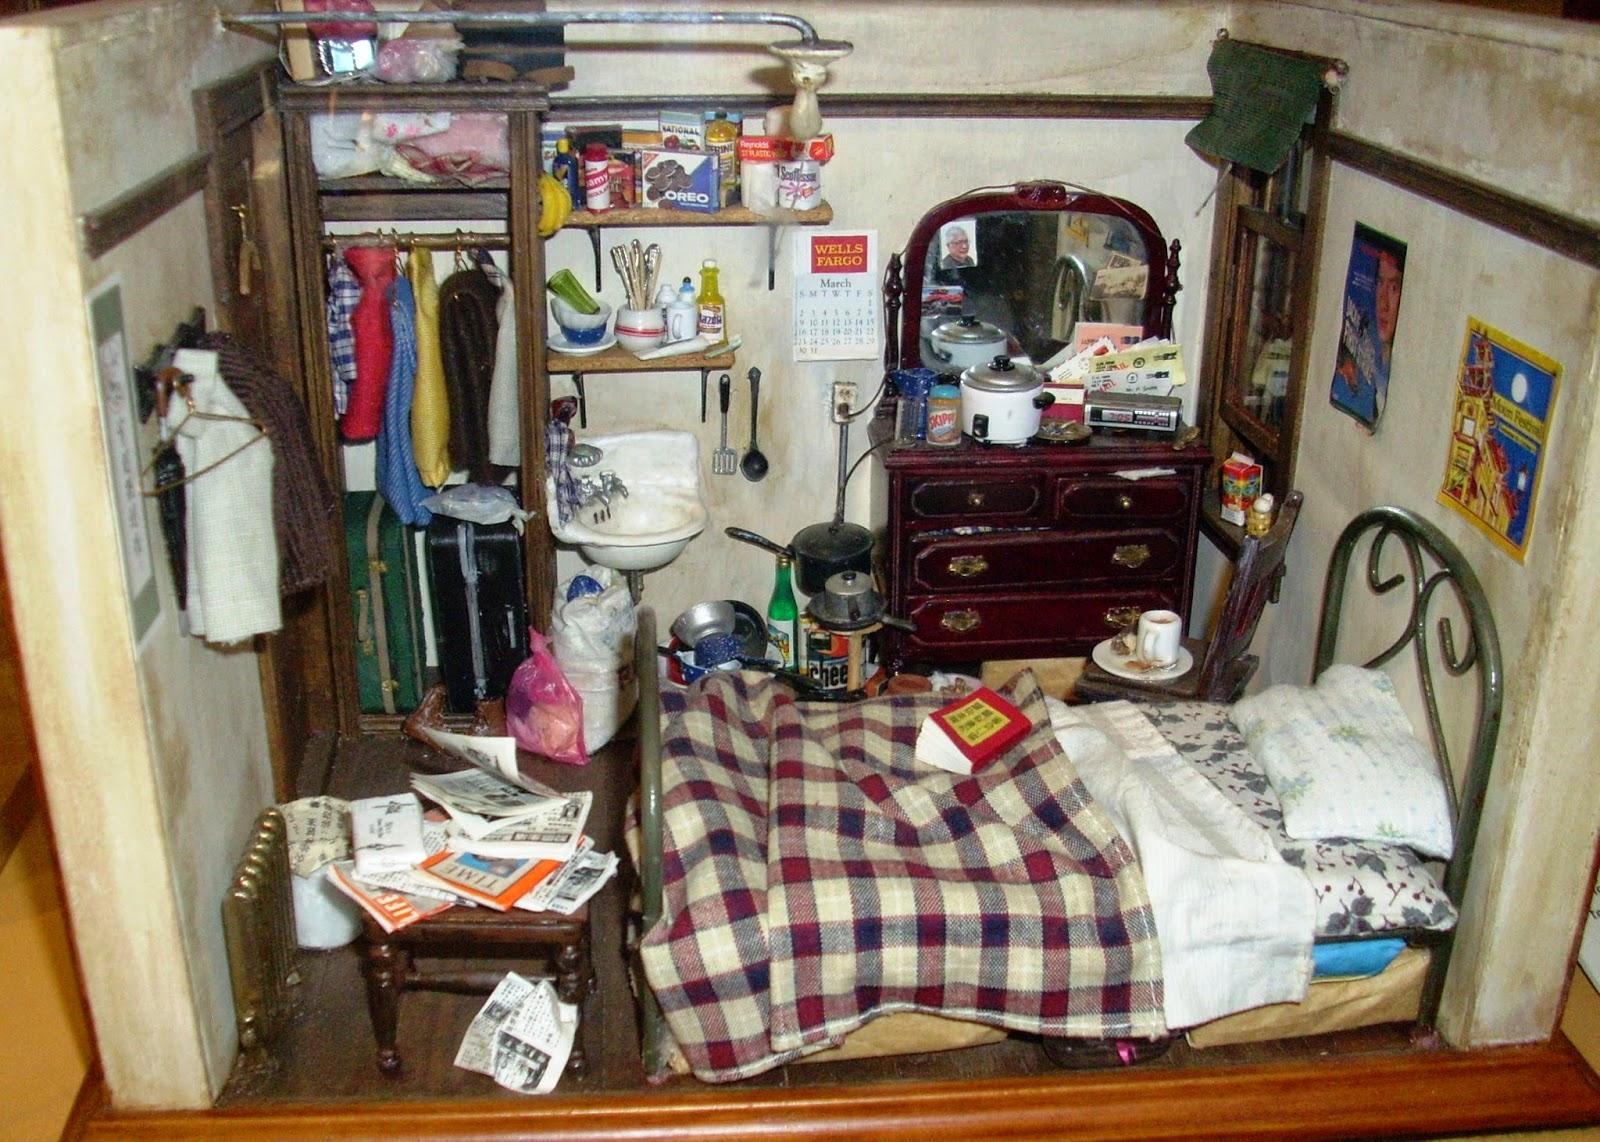 Single Room Occupancy Housing